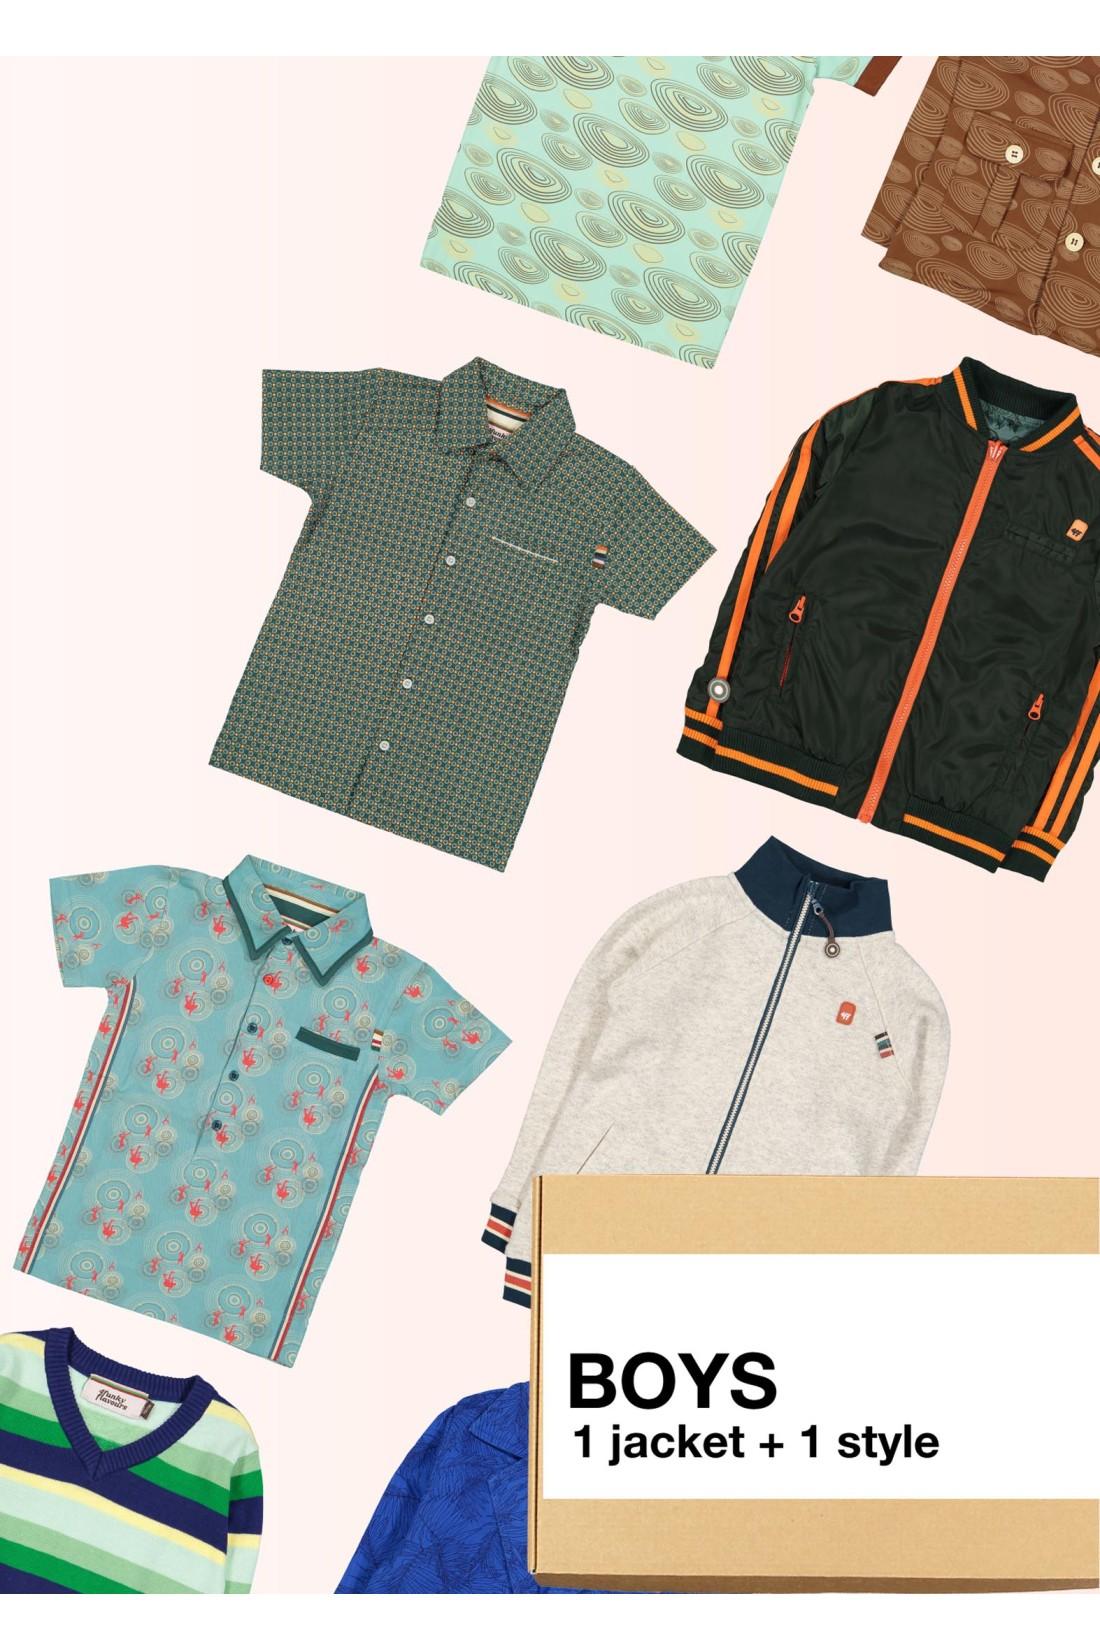 Surprise Box Boy - 2 Styles - Jacket + Extra Style